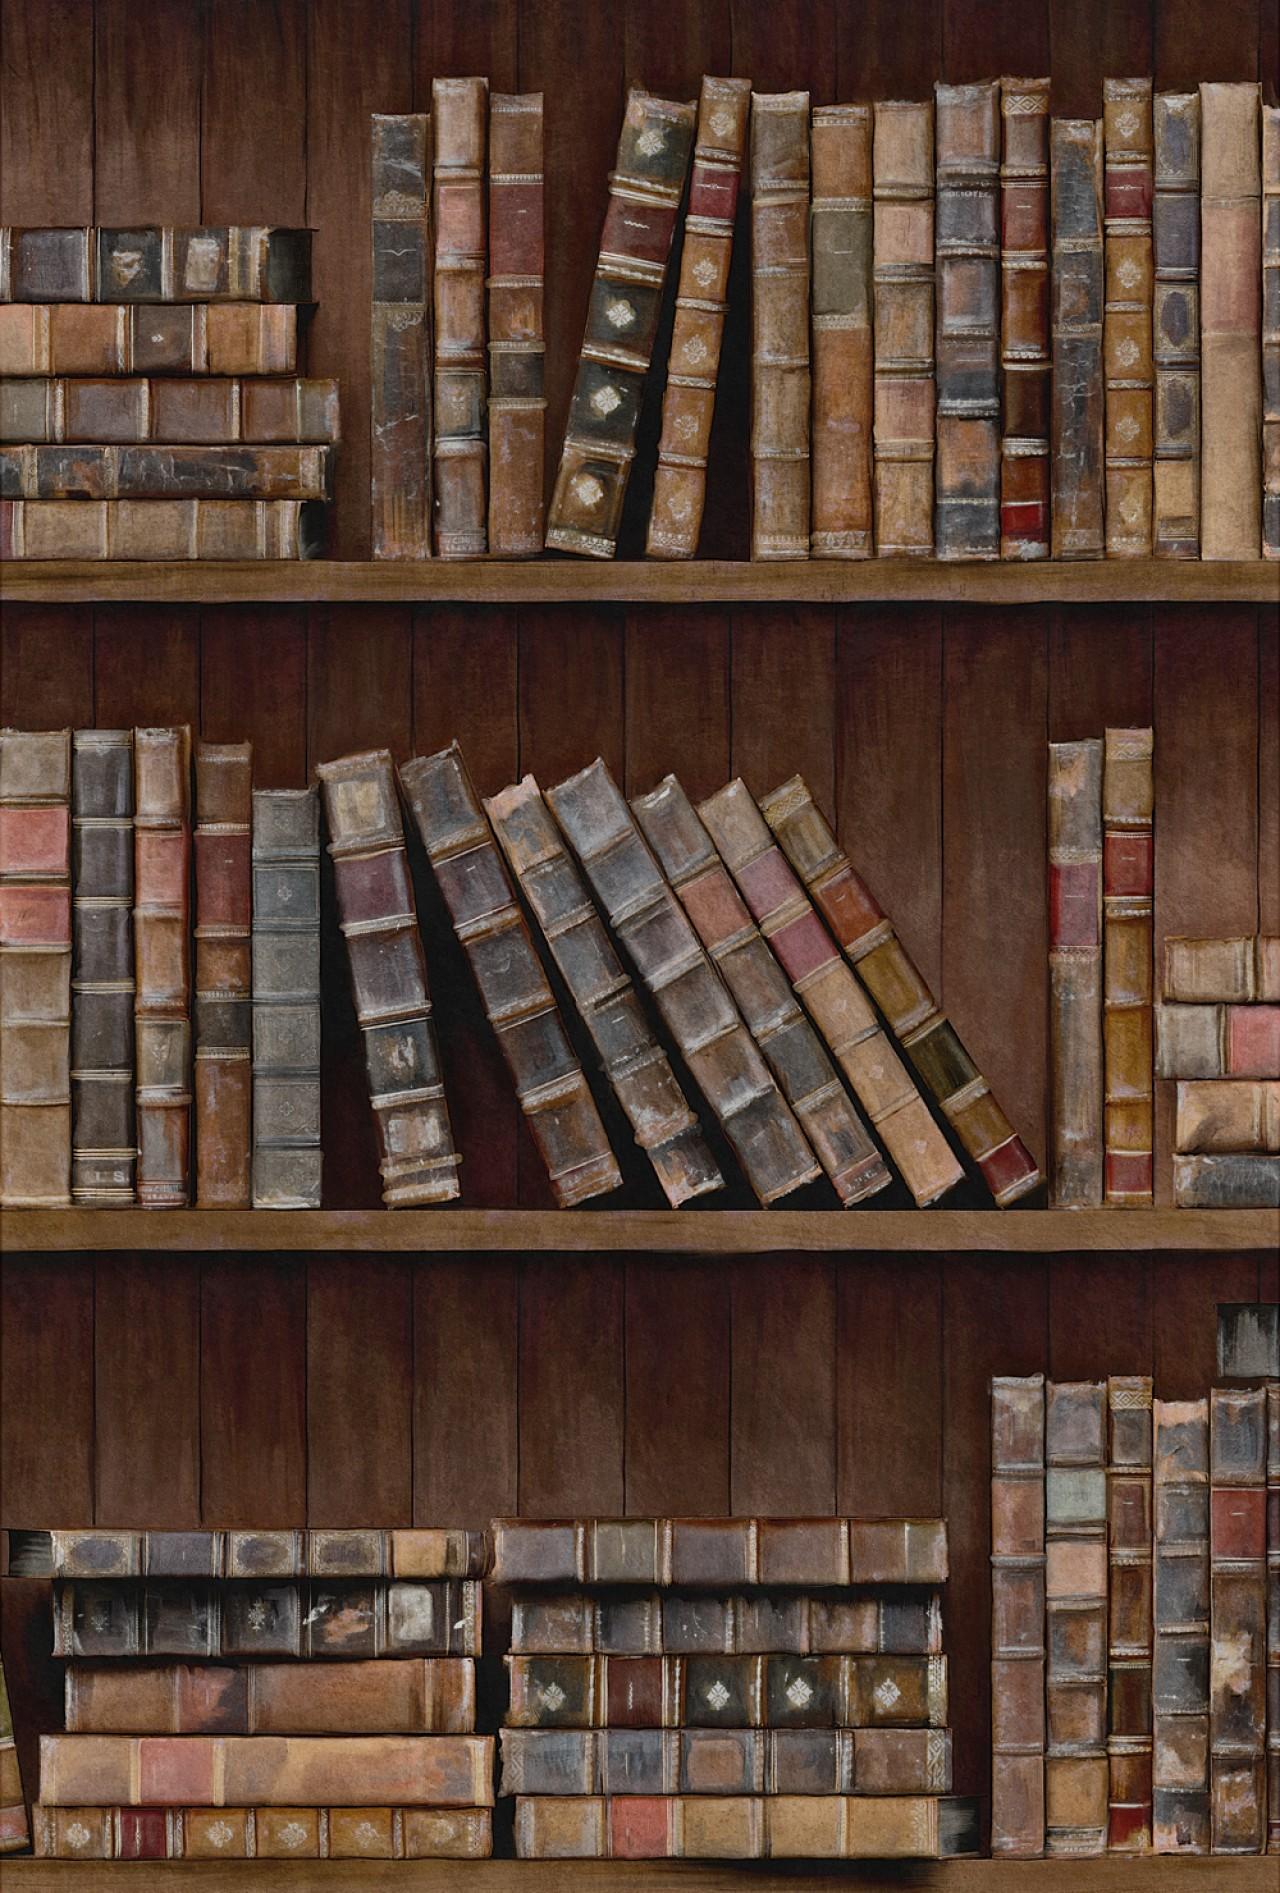 BOOK SHELVES Premium Wallpaper